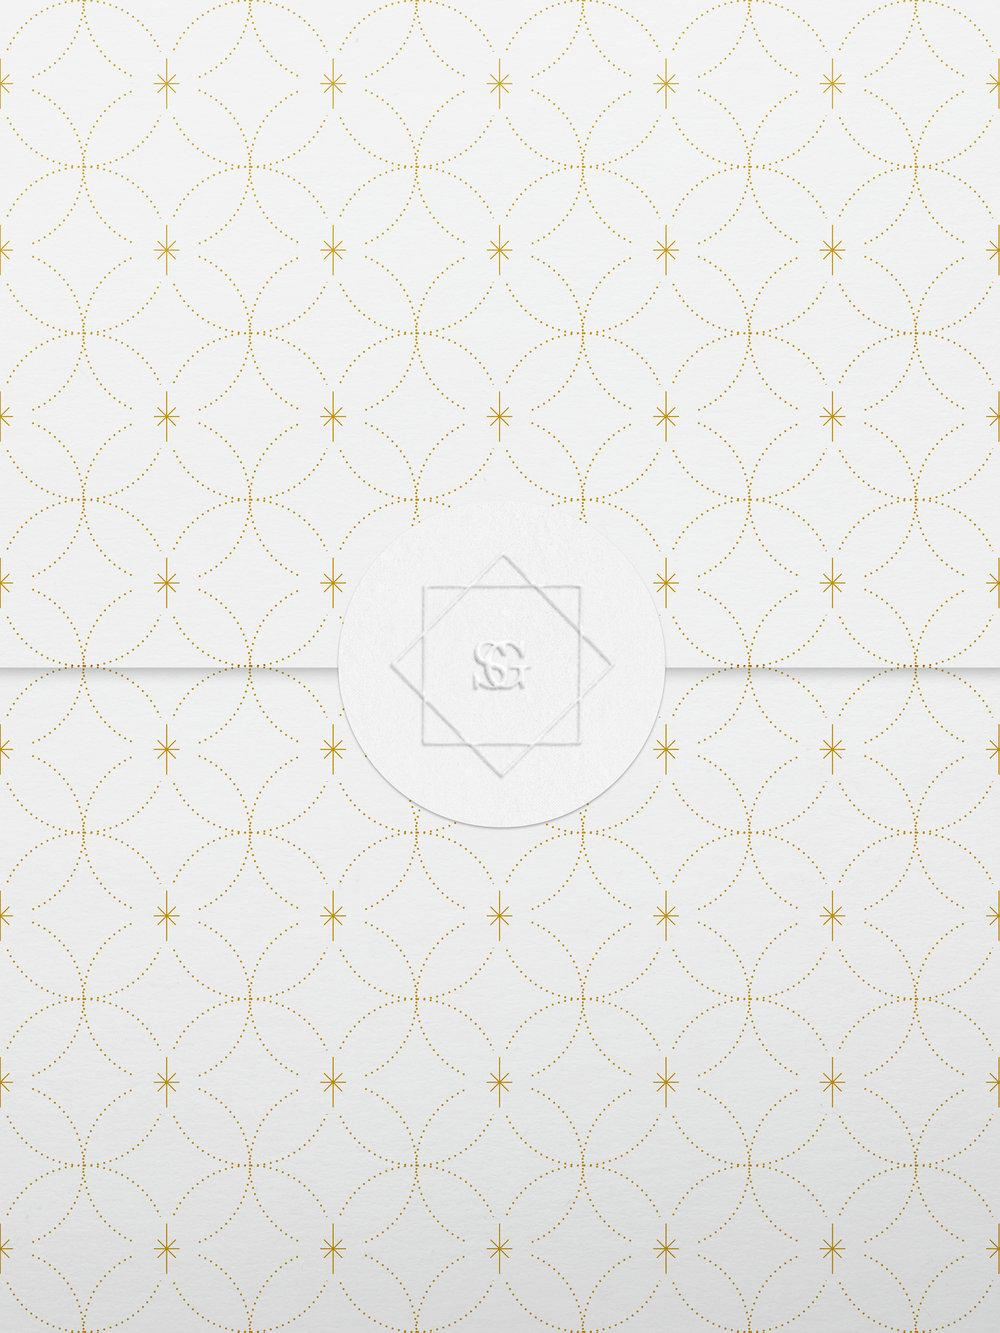 SG_Elements-05.jpg